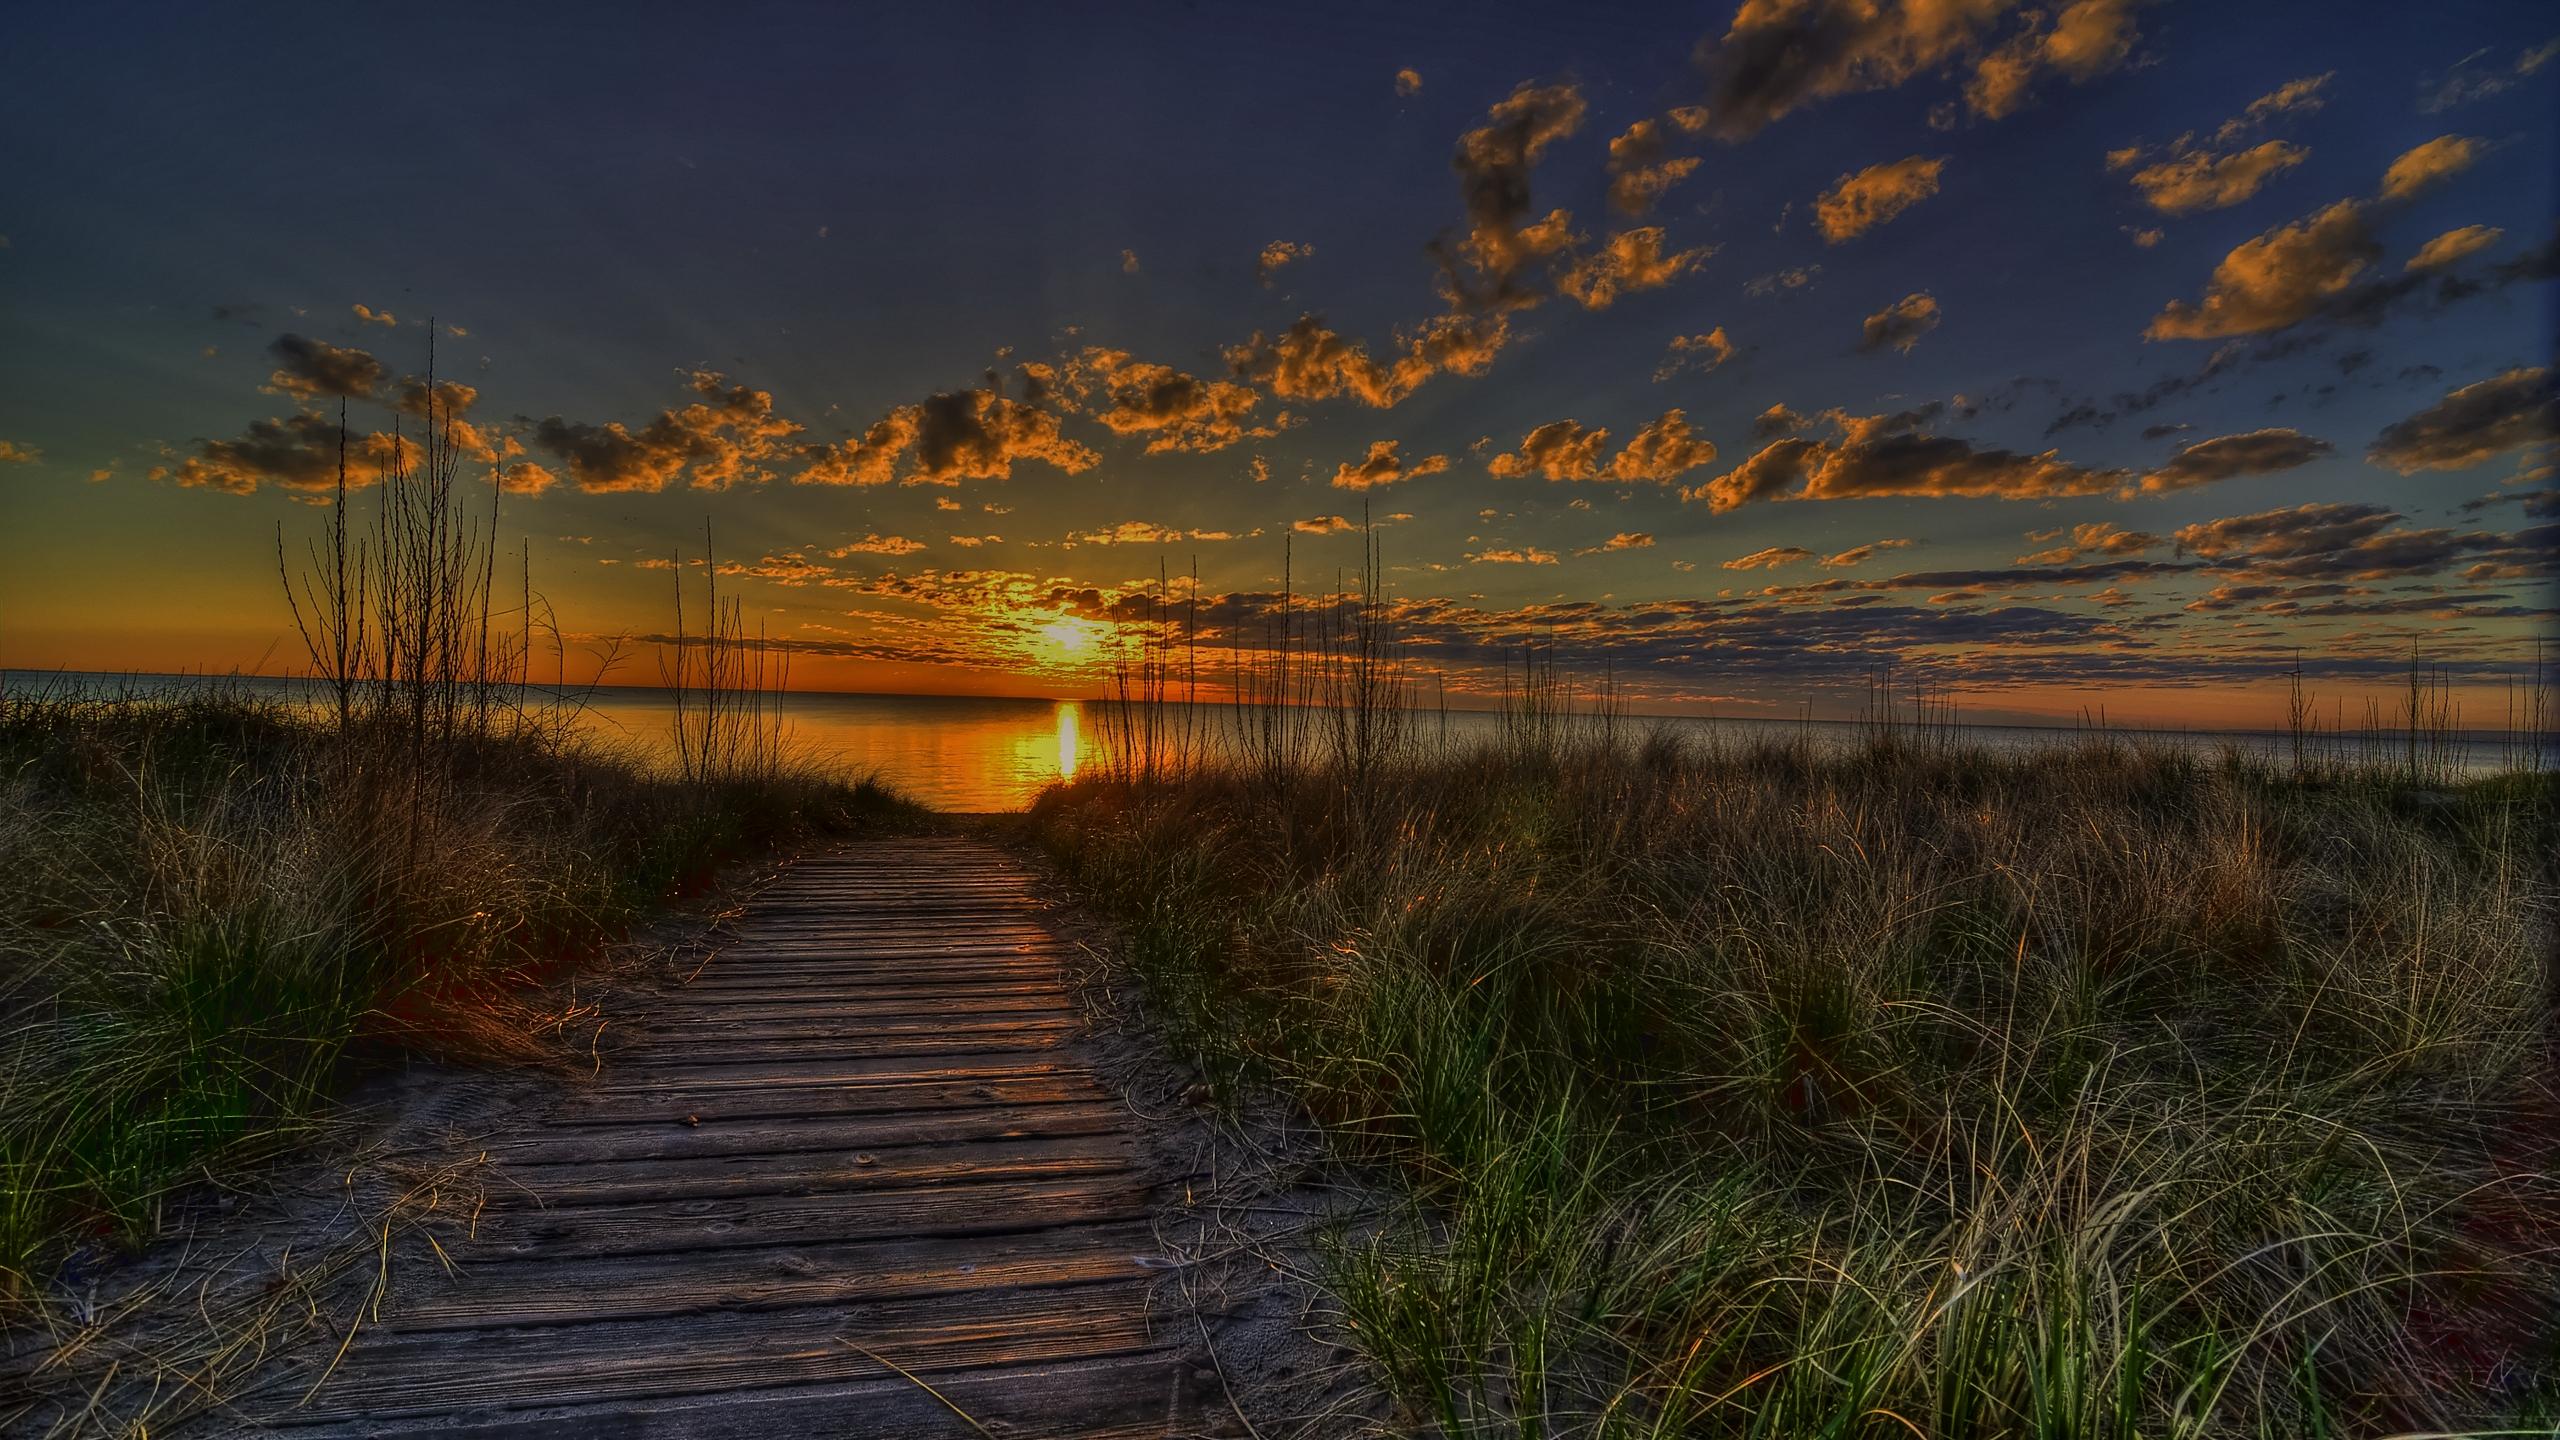 summer sunset landscape wallpaper - photo #16